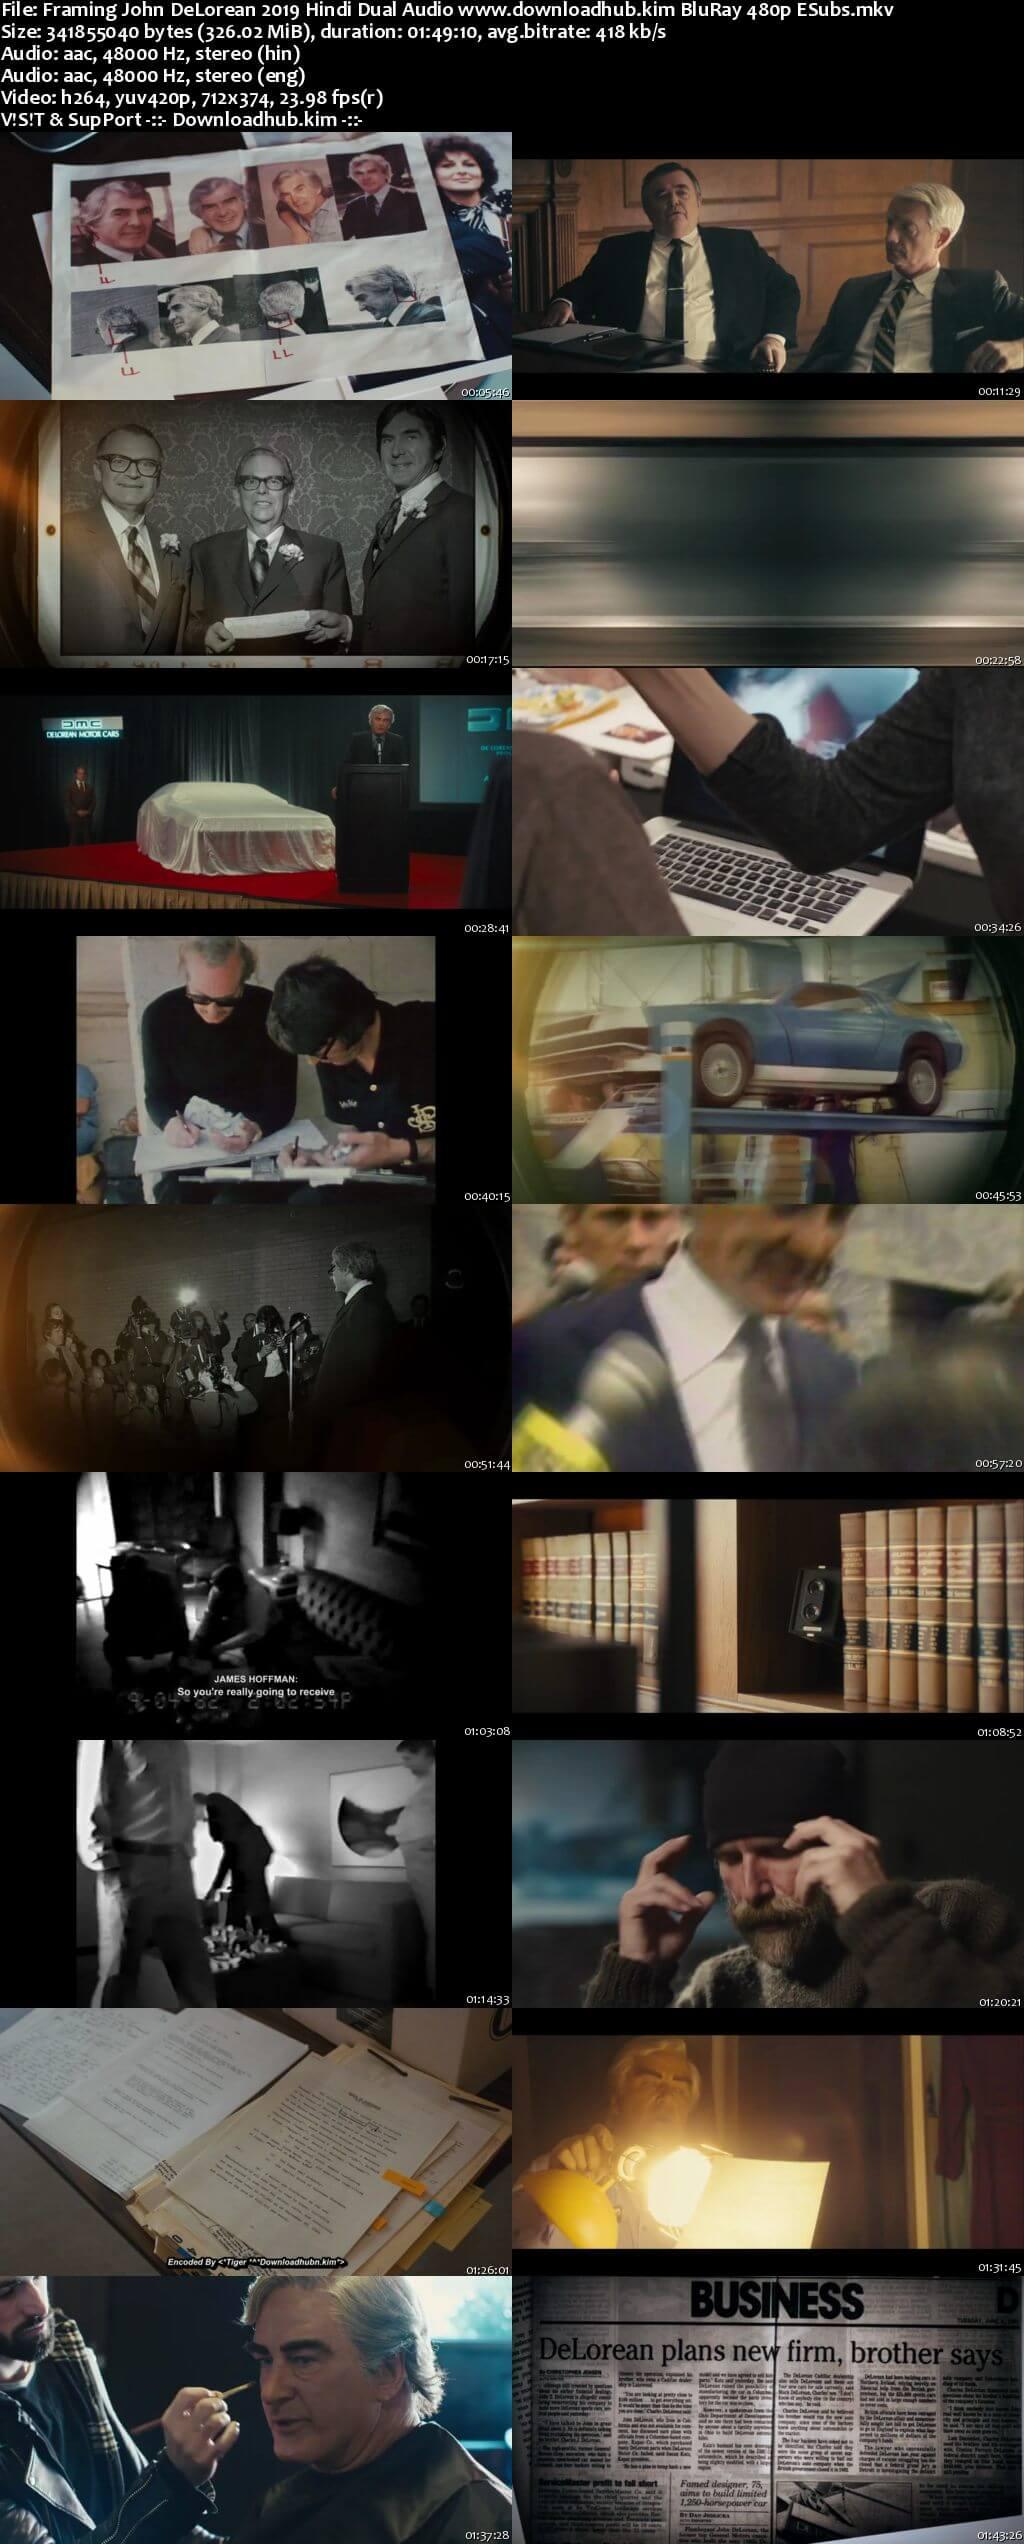 Framing John DeLorean 2019 Hindi Dual Audio 300MB BluRay 480p ESubs